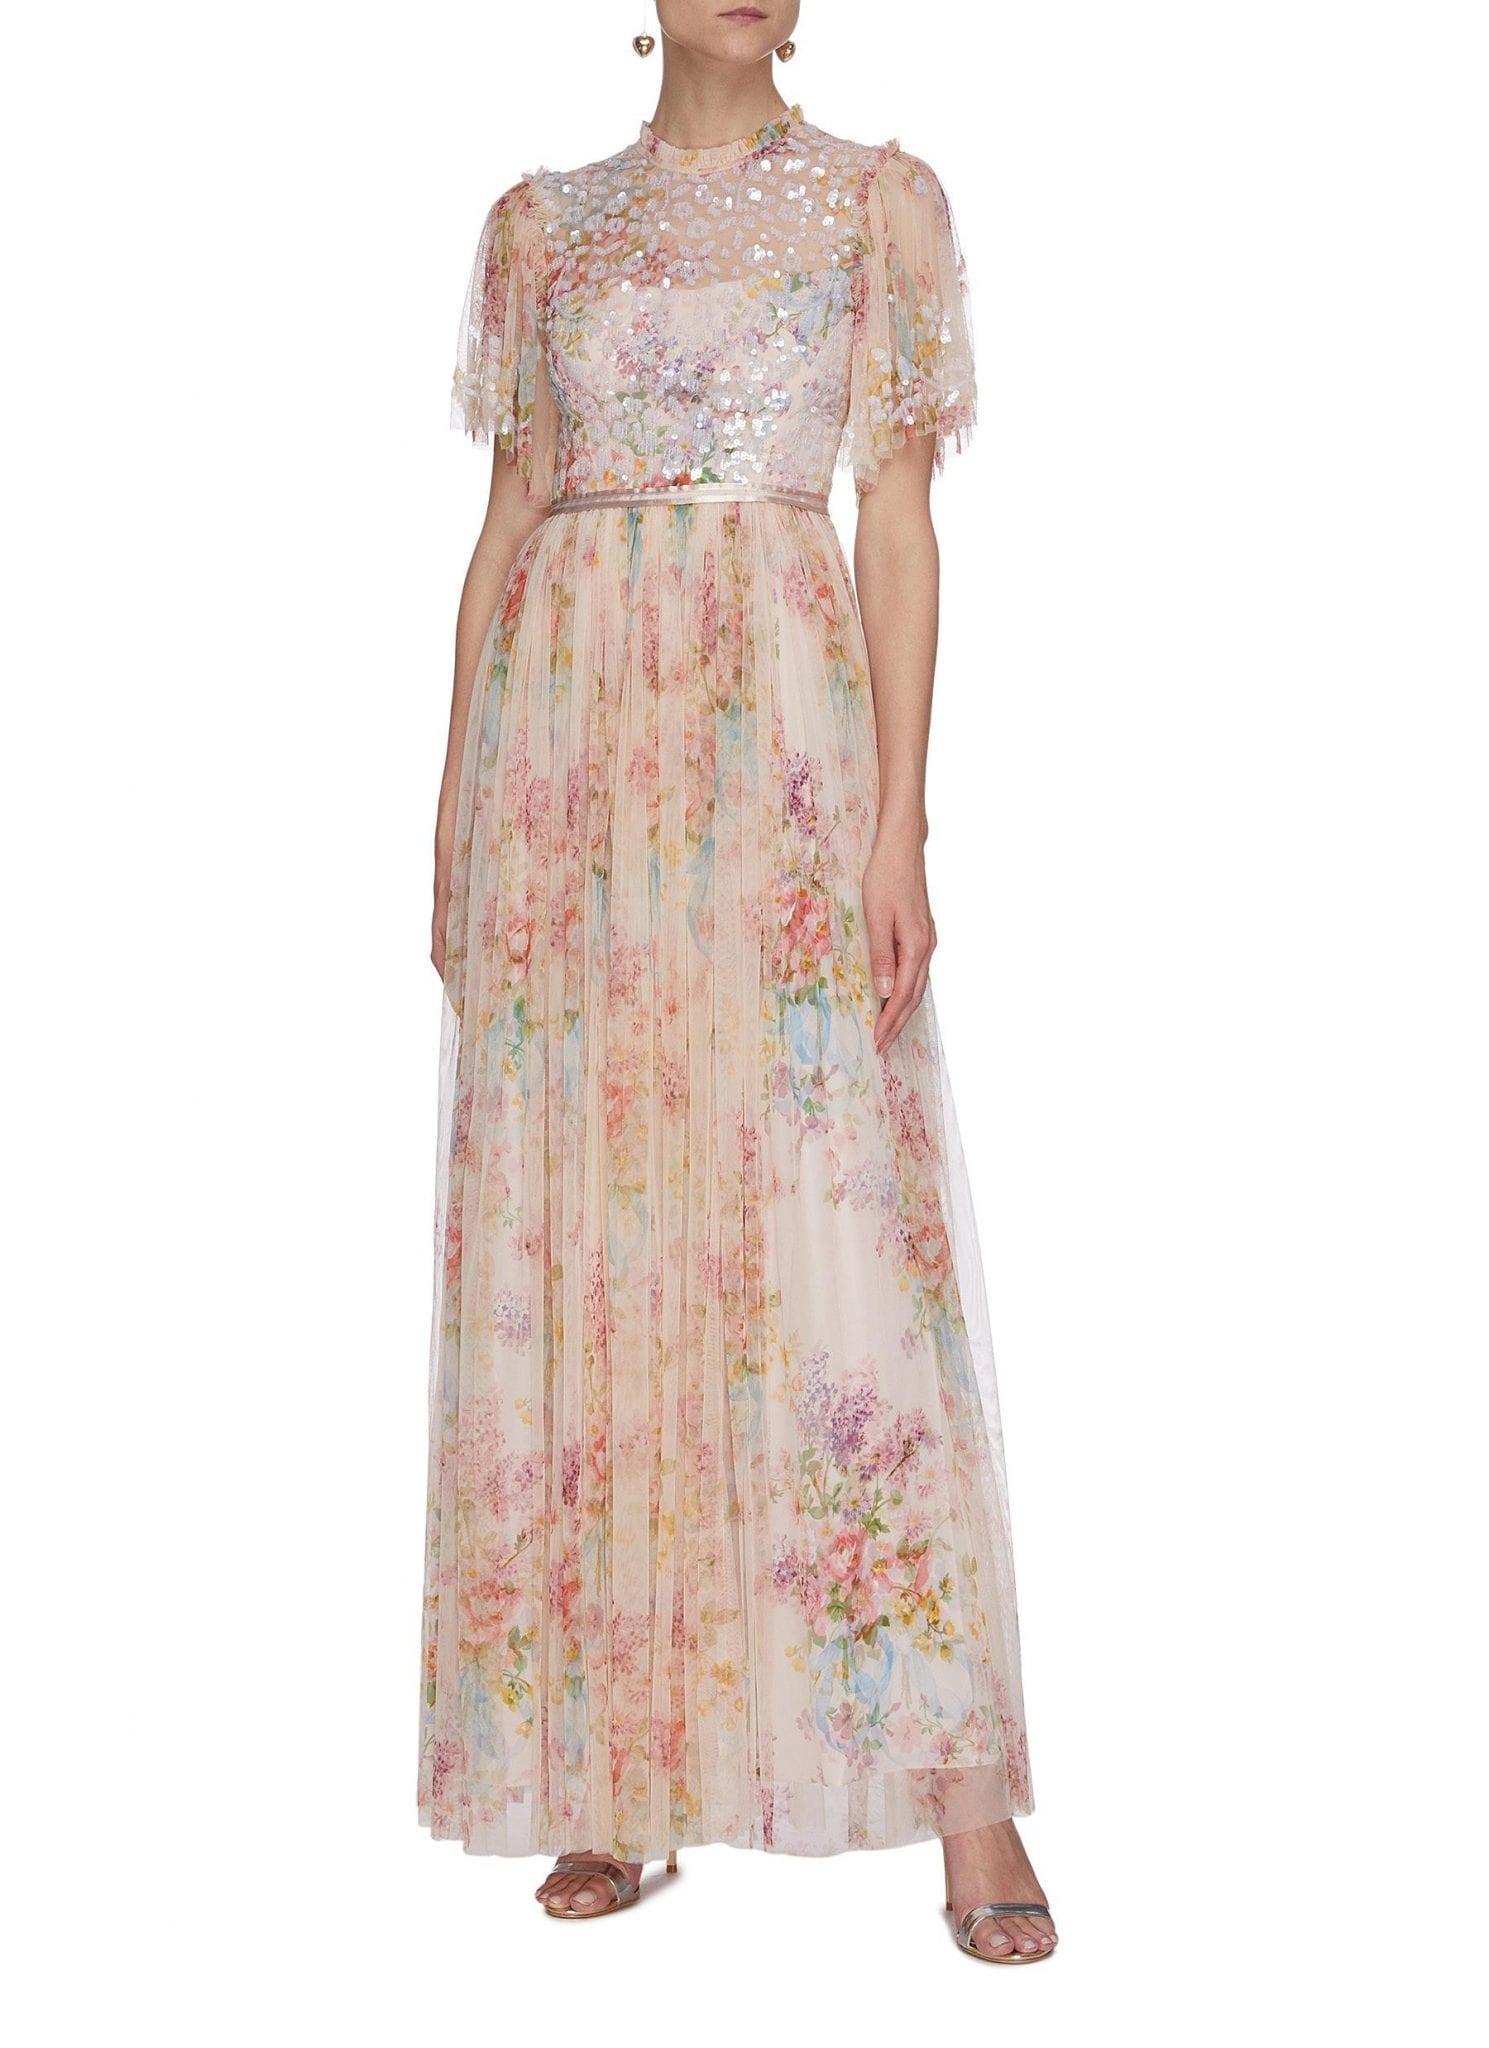 NEEDLE & THREAD 'Floral Diamond' Bodice Short Sleeve Maxi Dress